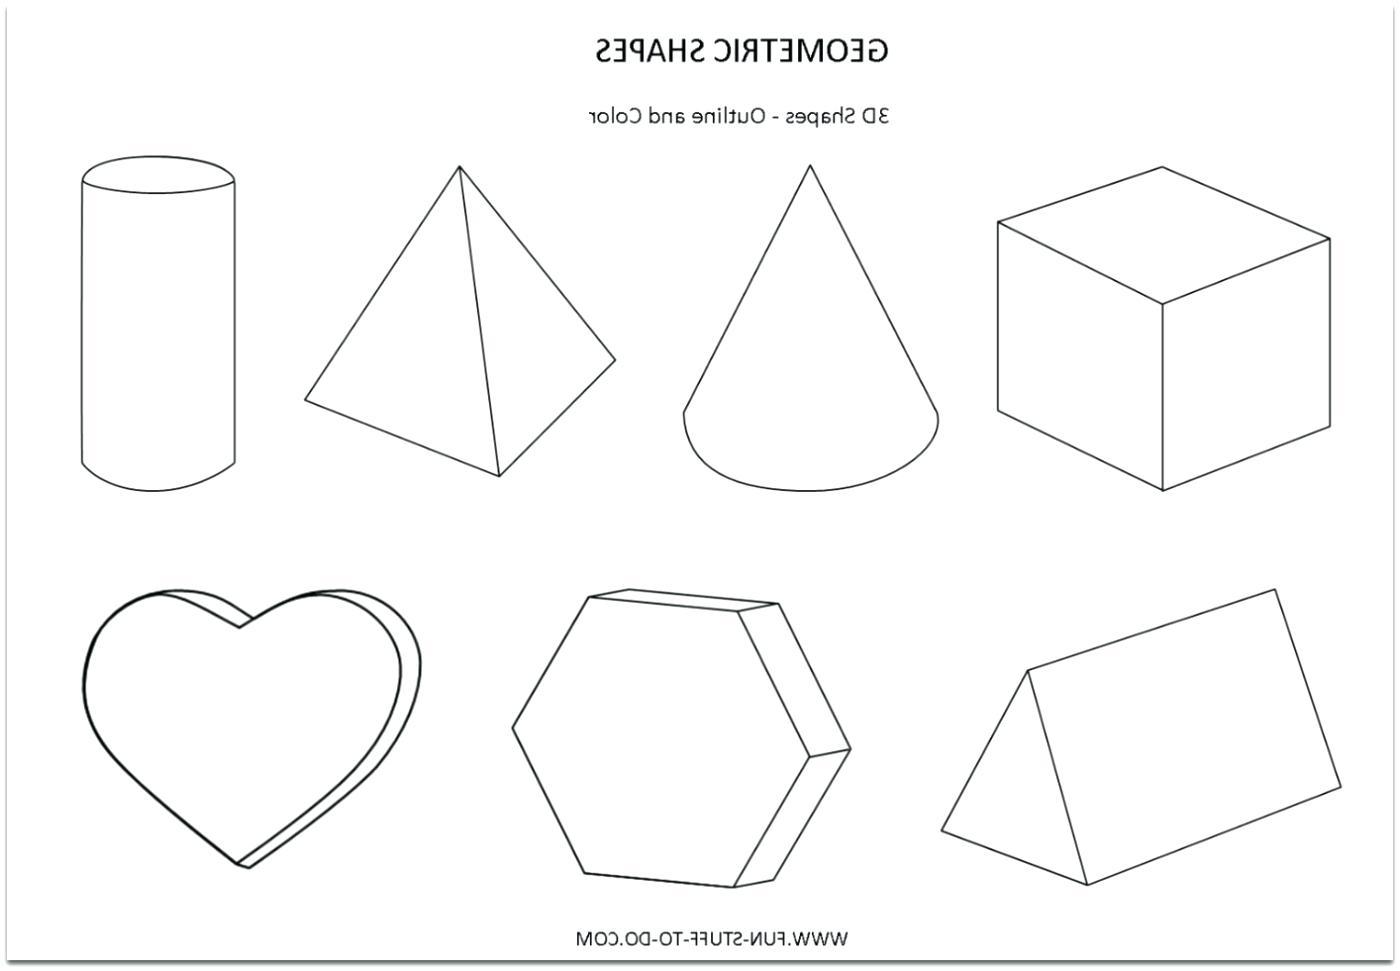 worksheet Non Symmetrical Shapes Worksheet 3 dimensional shapes drawing at getdrawings com free for personal 1400x971 worksheet geometry worksheets shape image